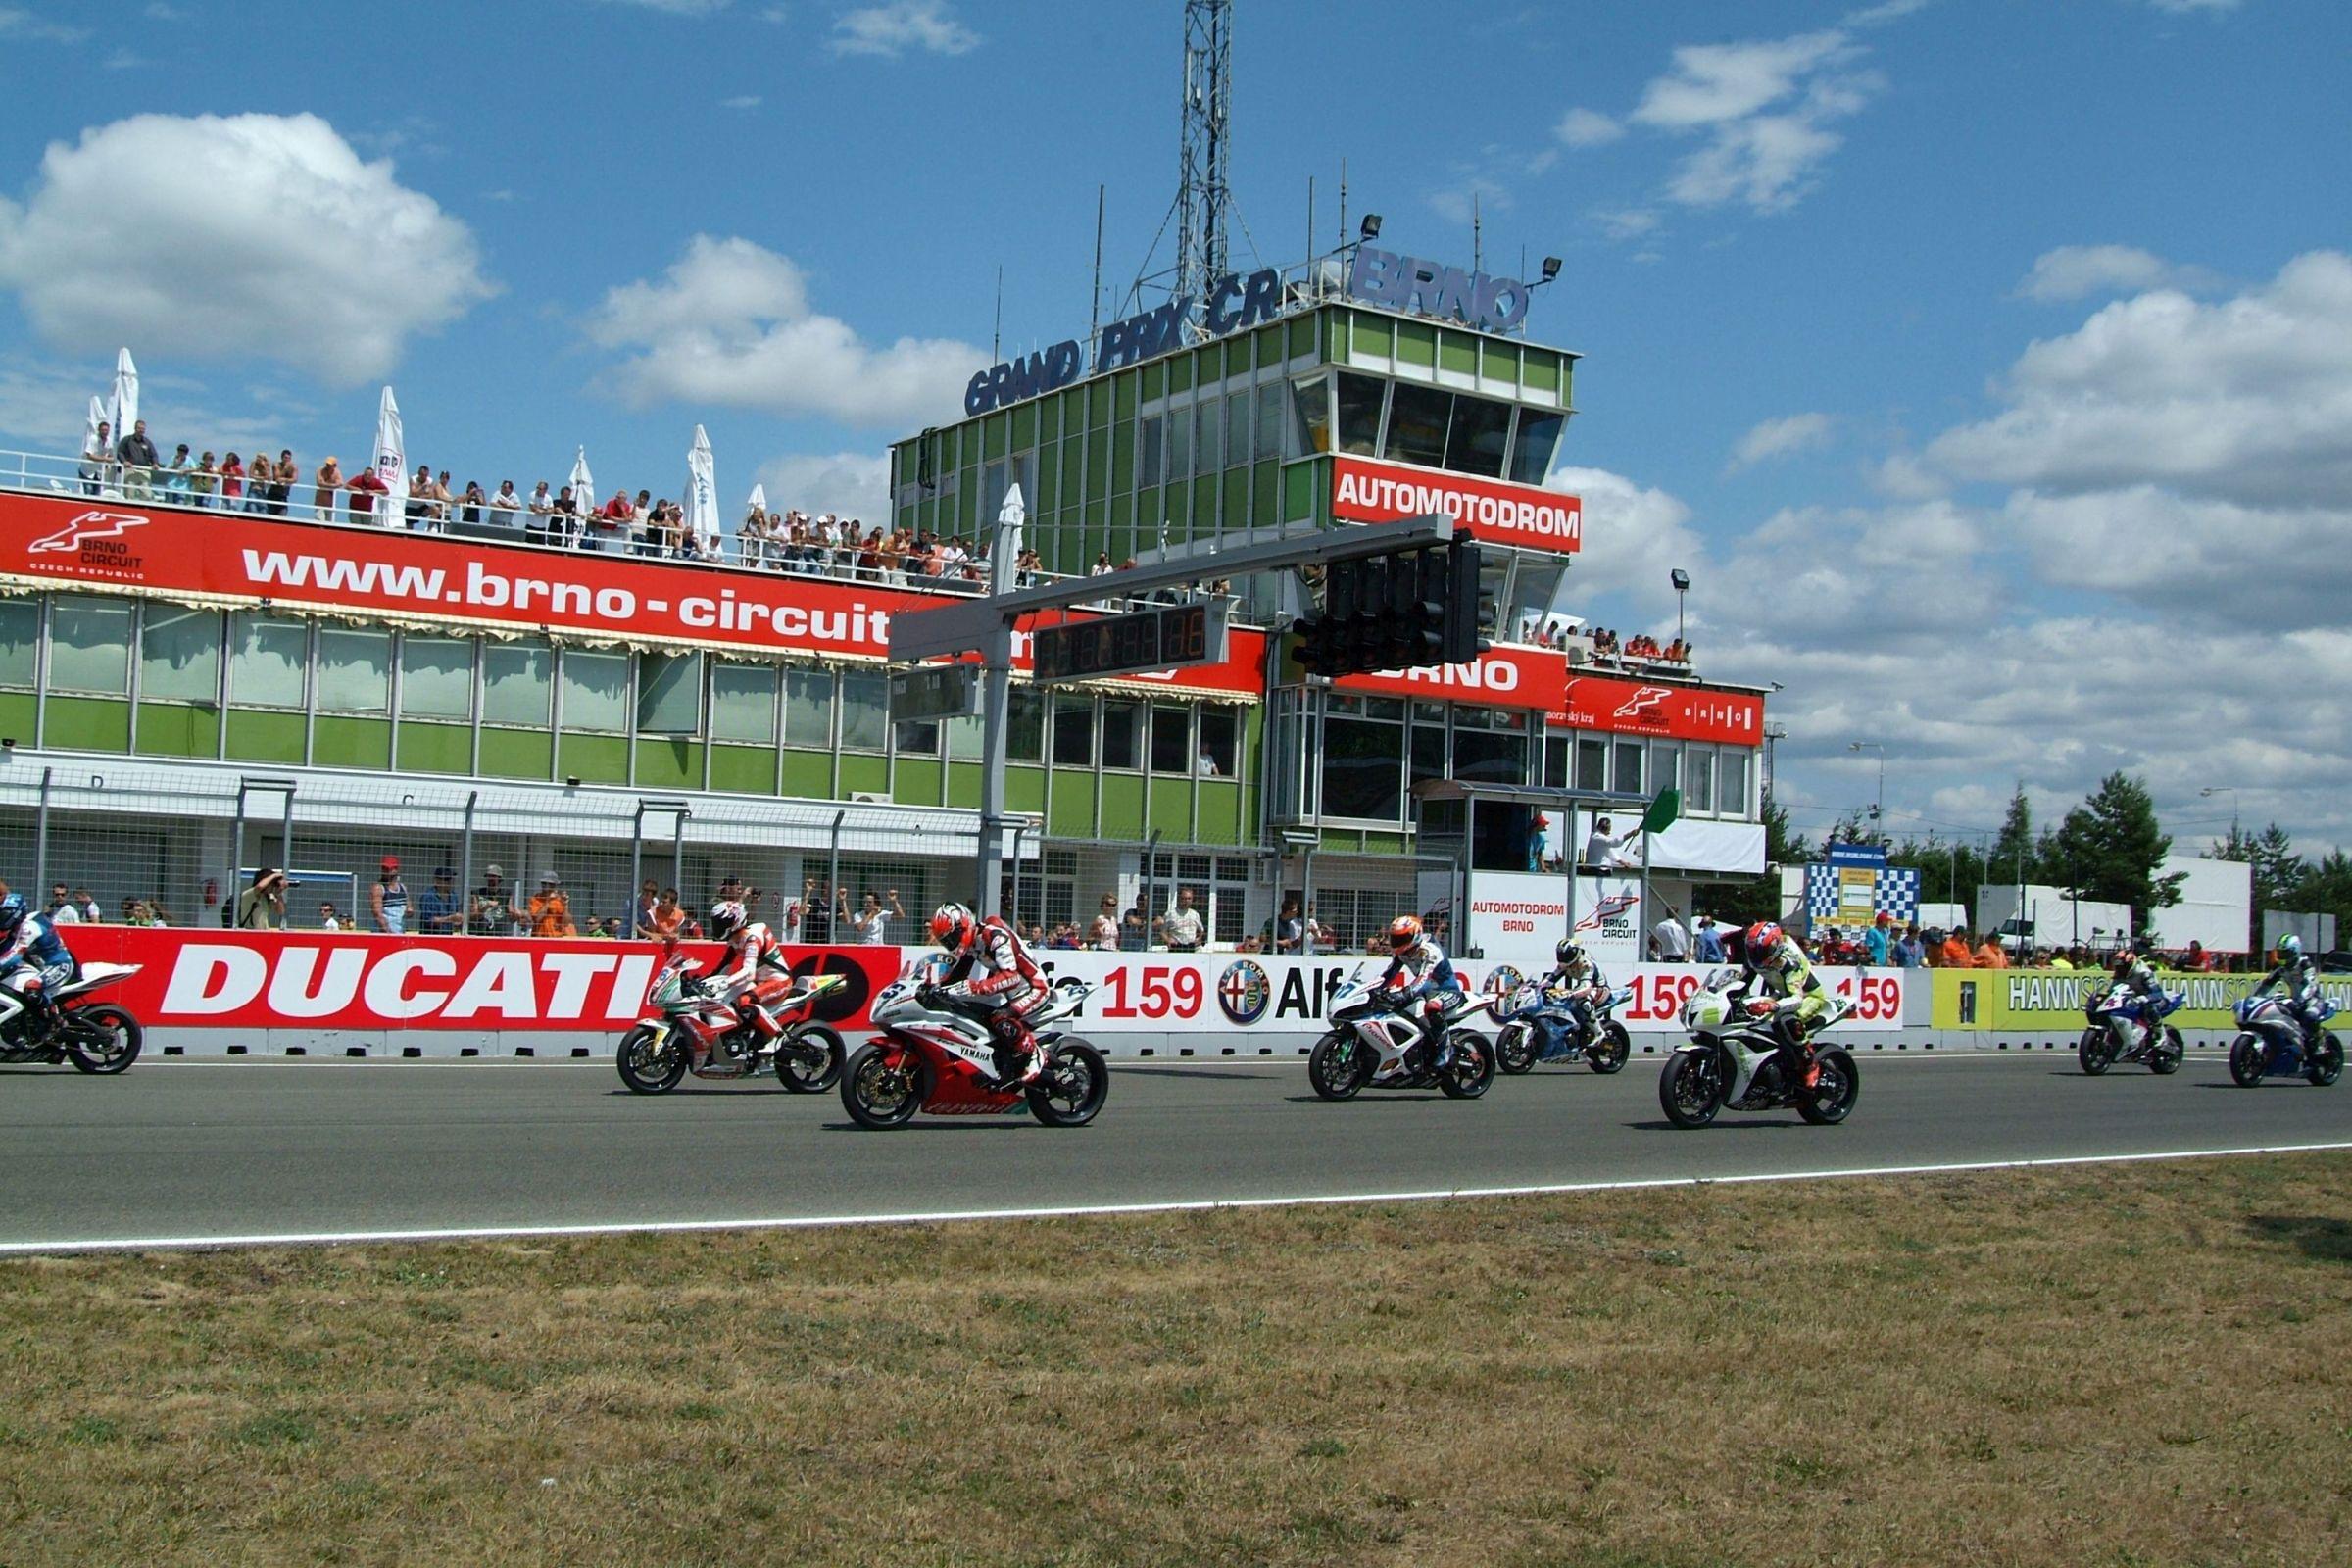 Masaryk Circuit (Masarykův okruh) in Brno